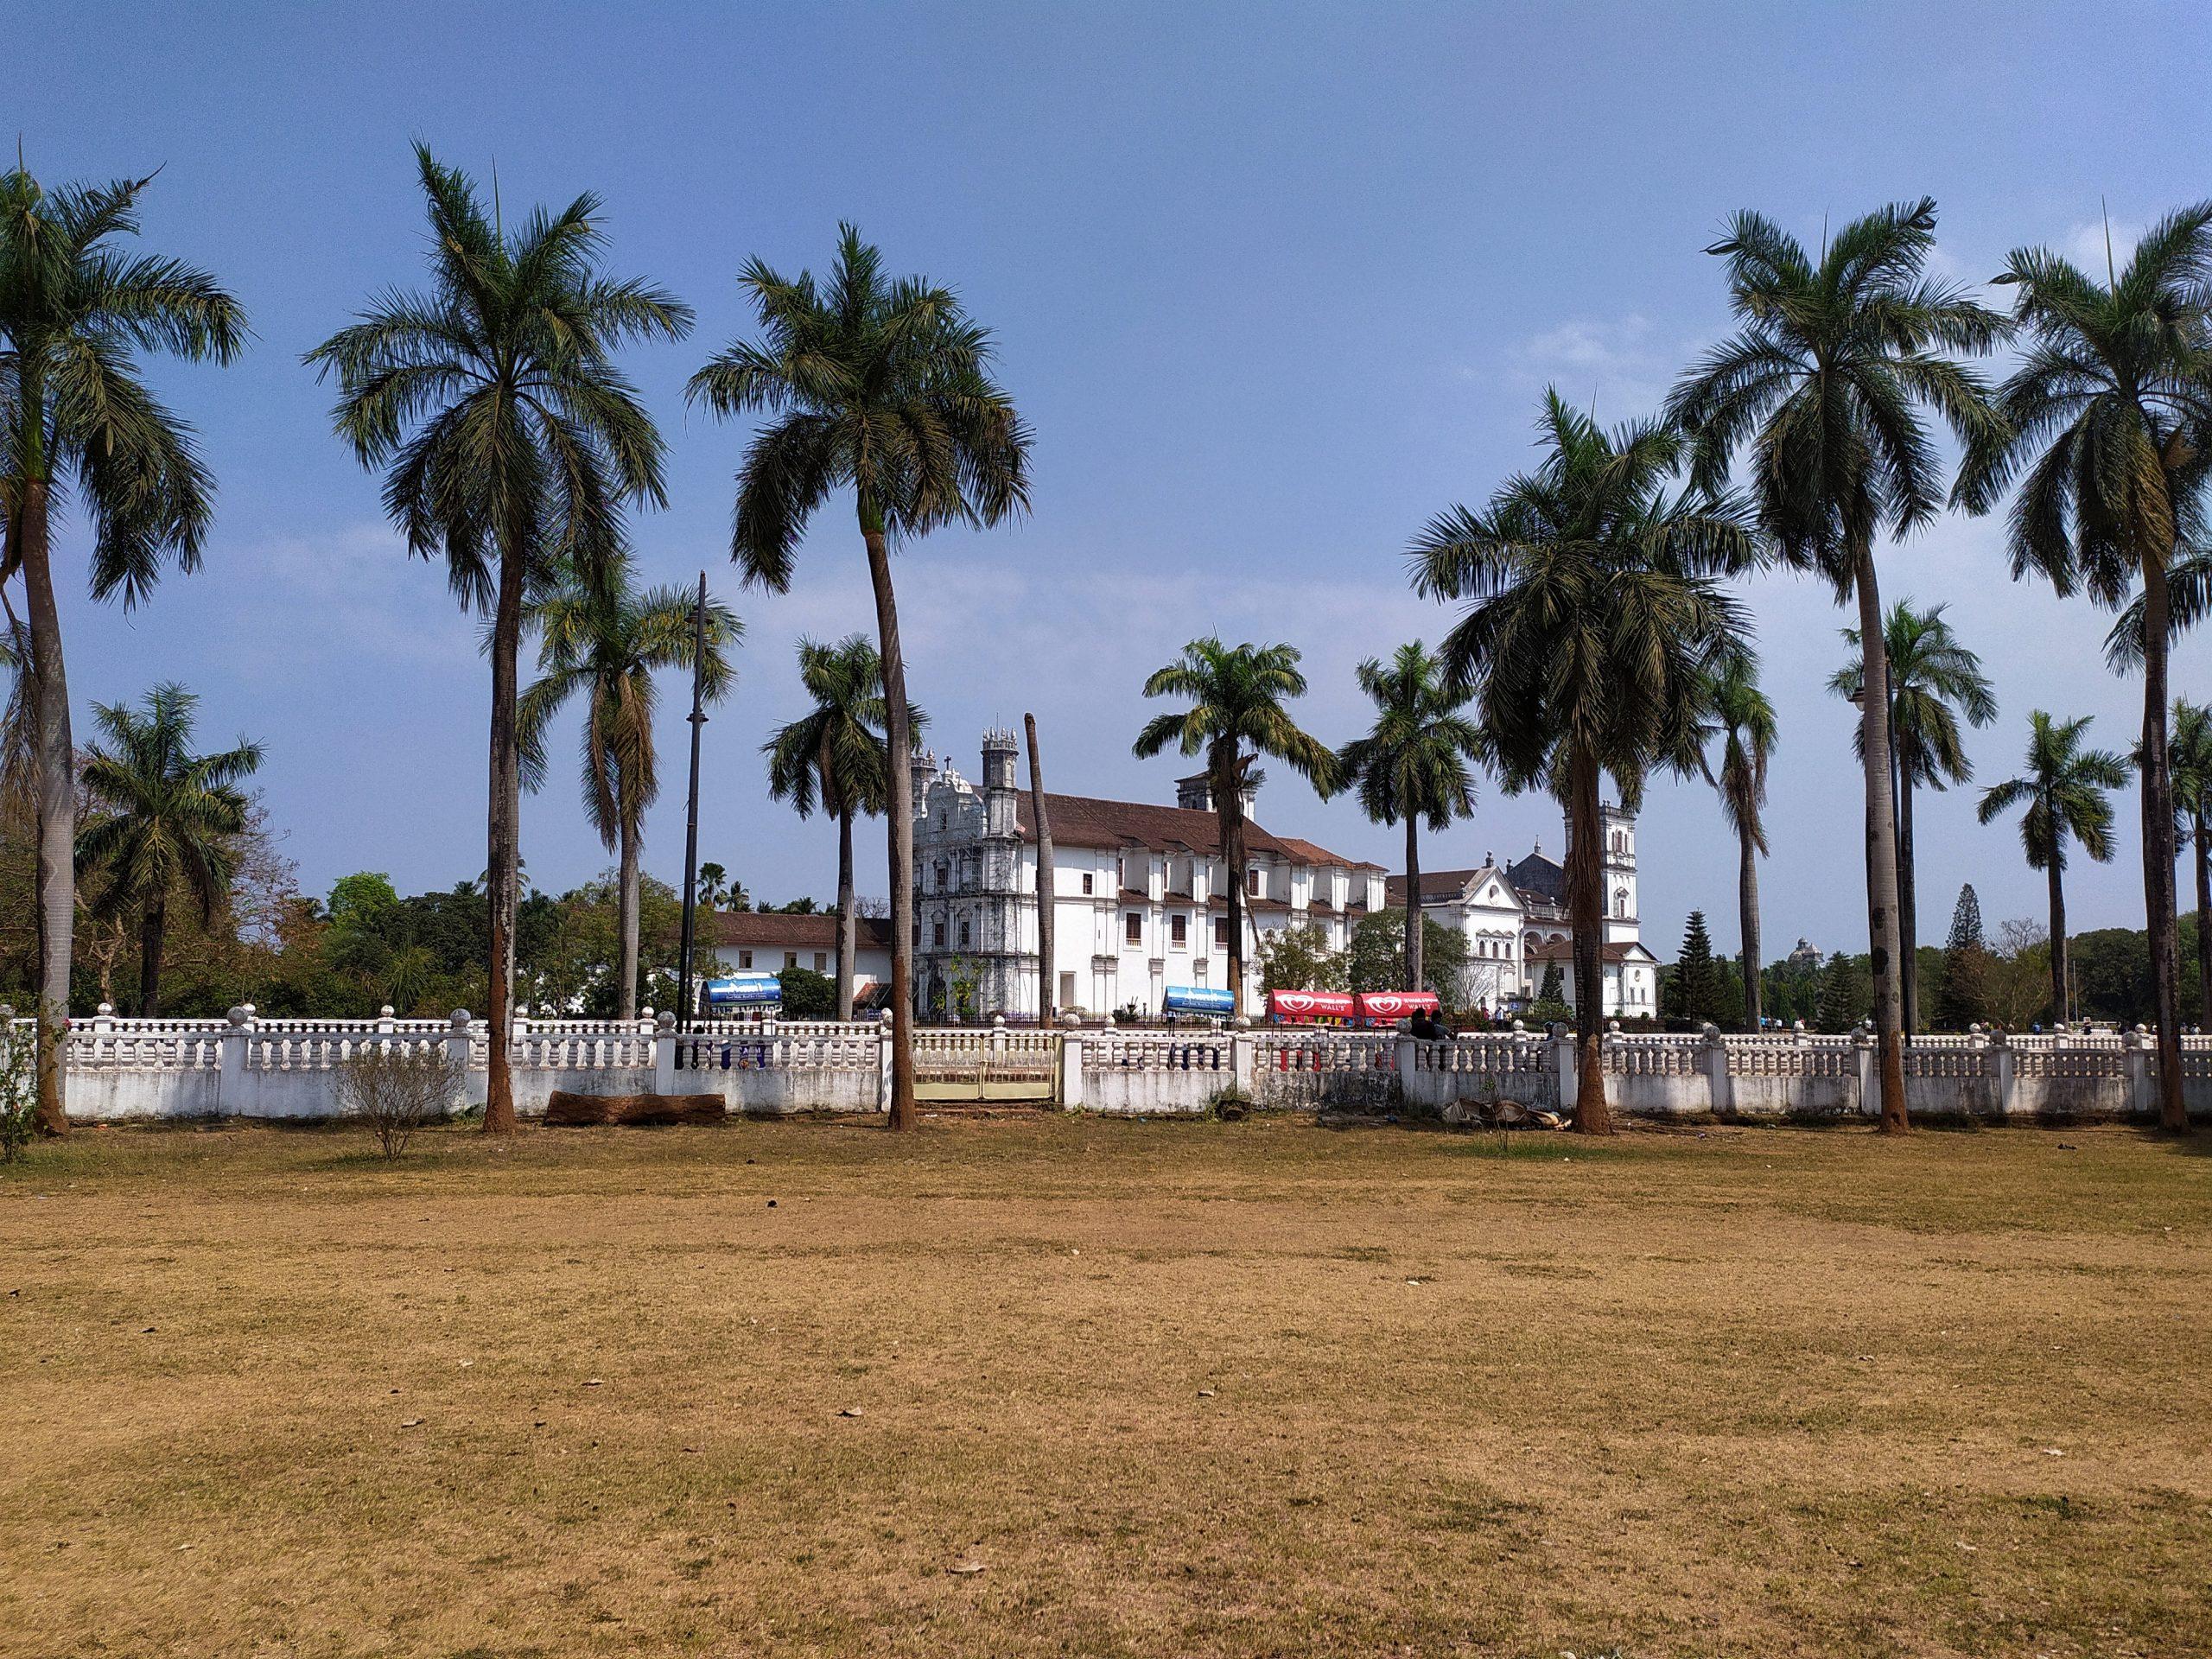 A building around palm trees